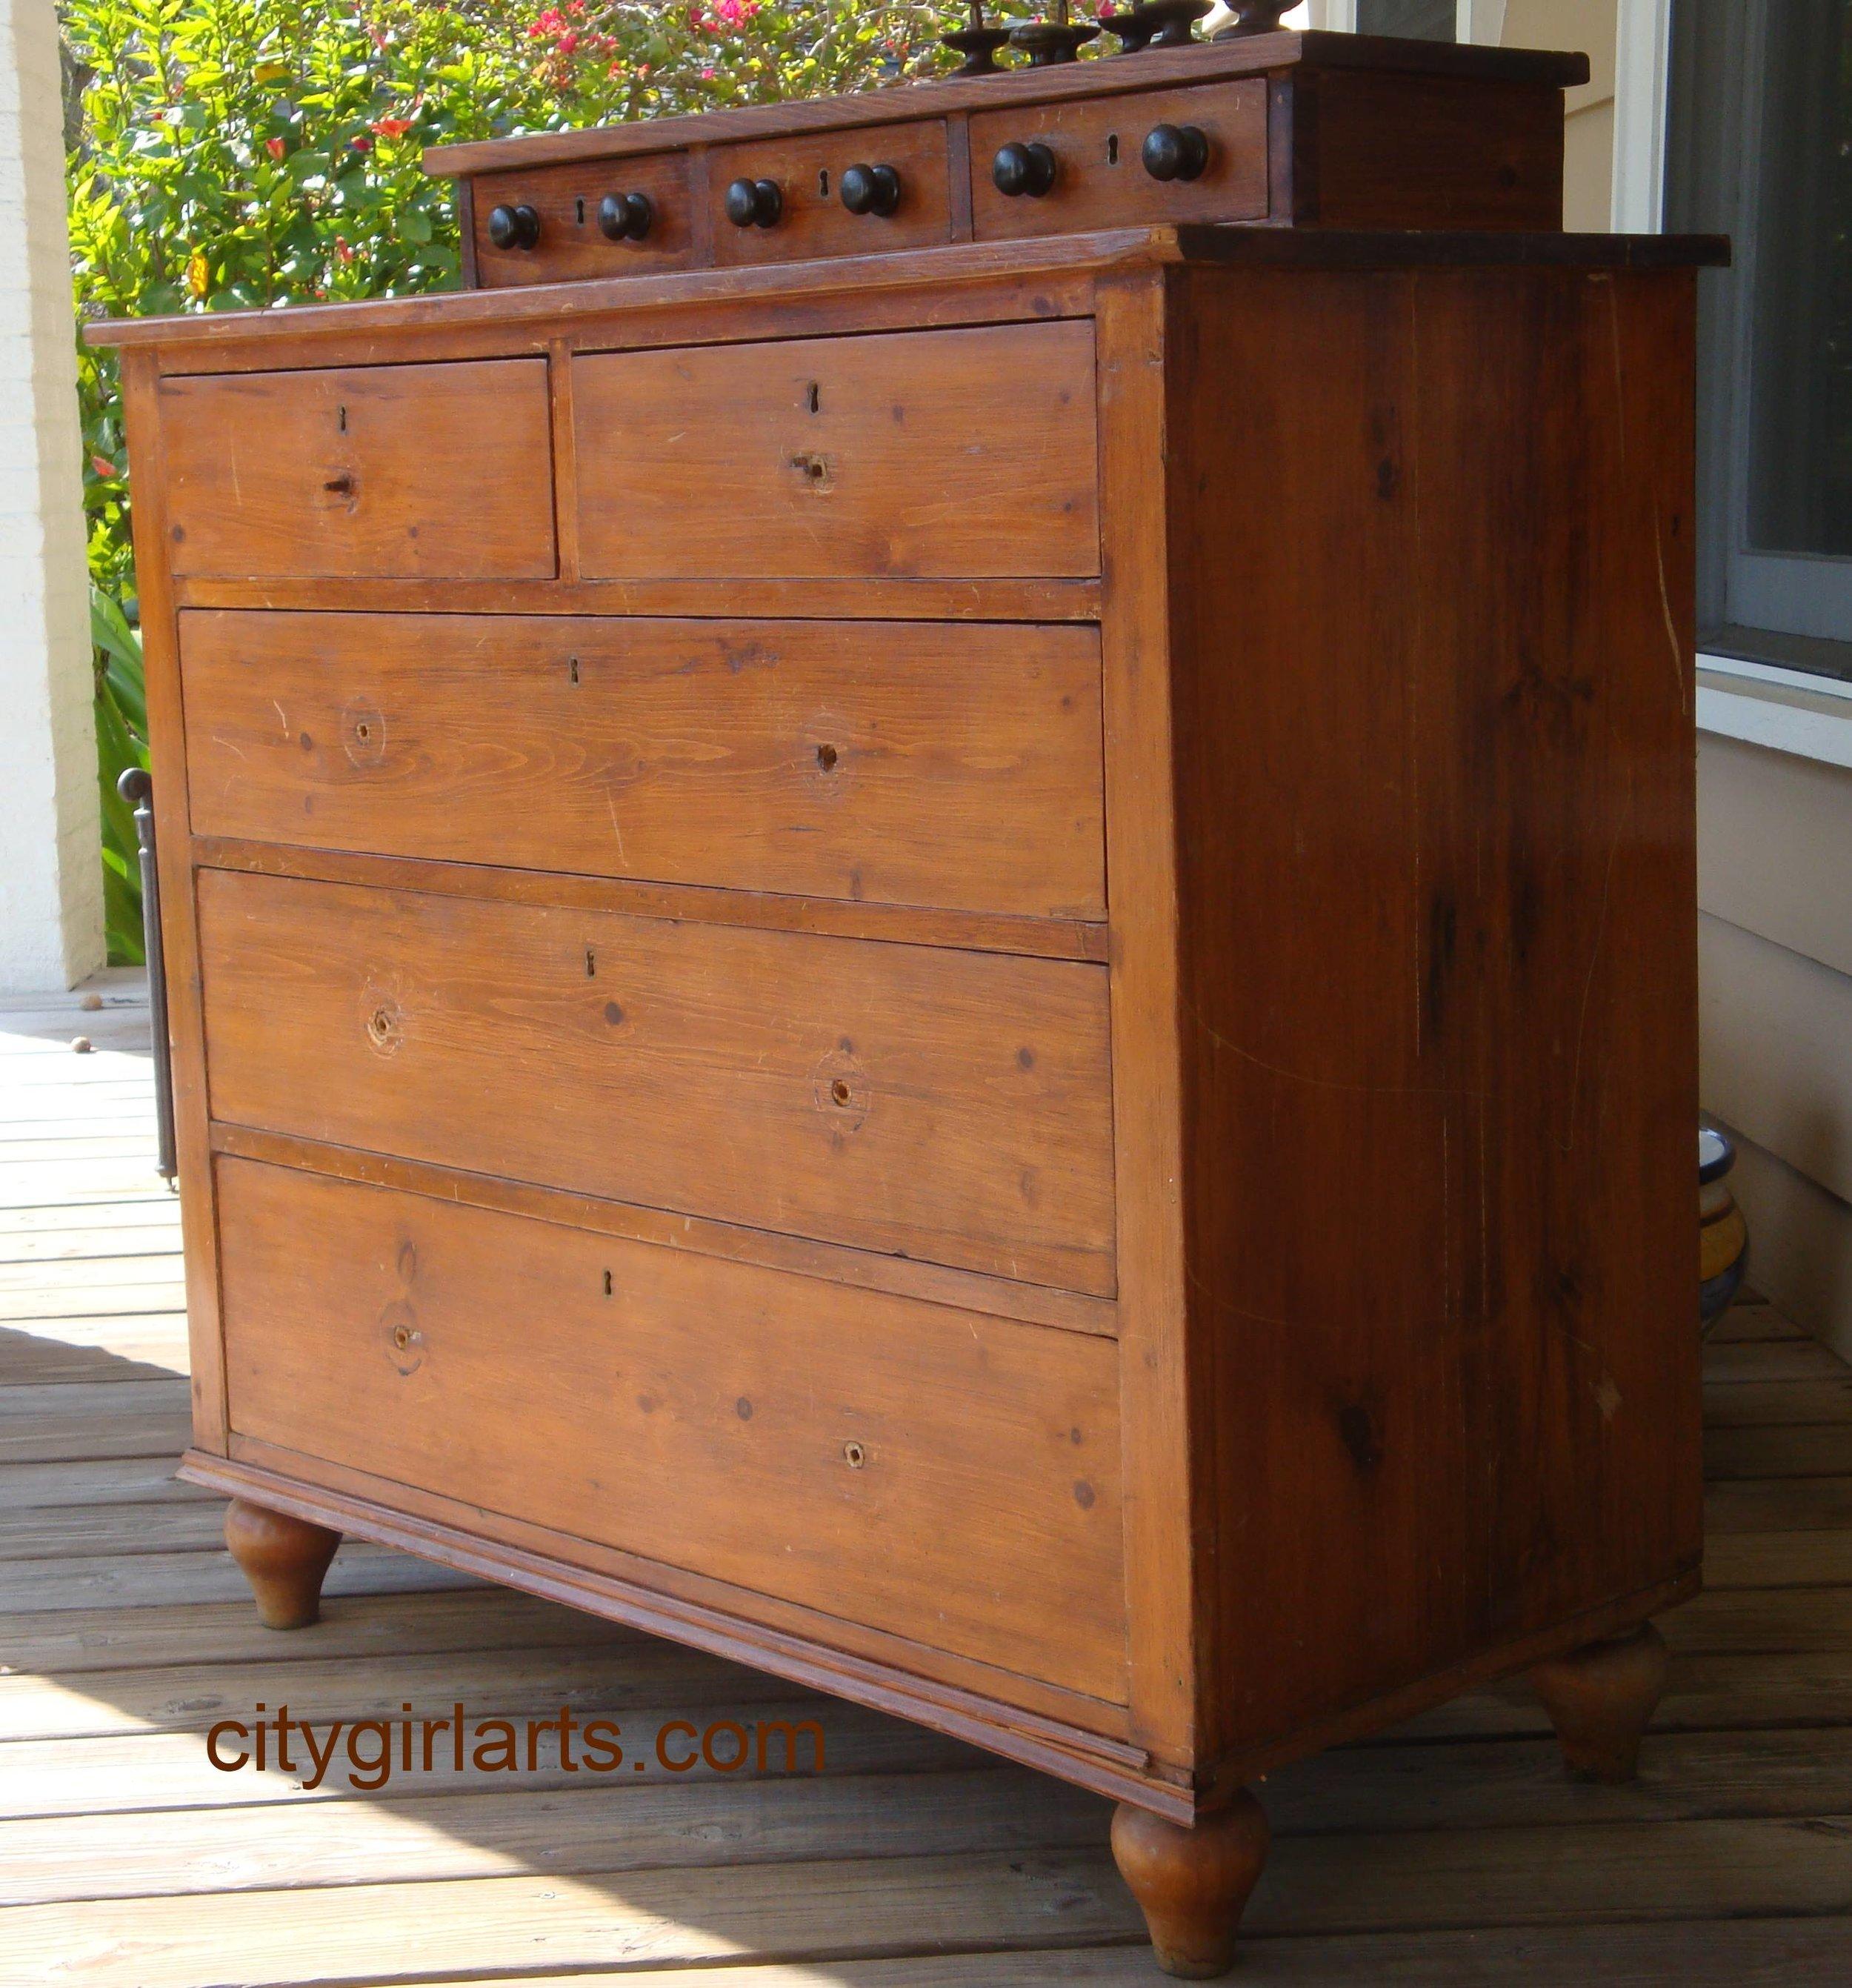 Old Pine Dresser before